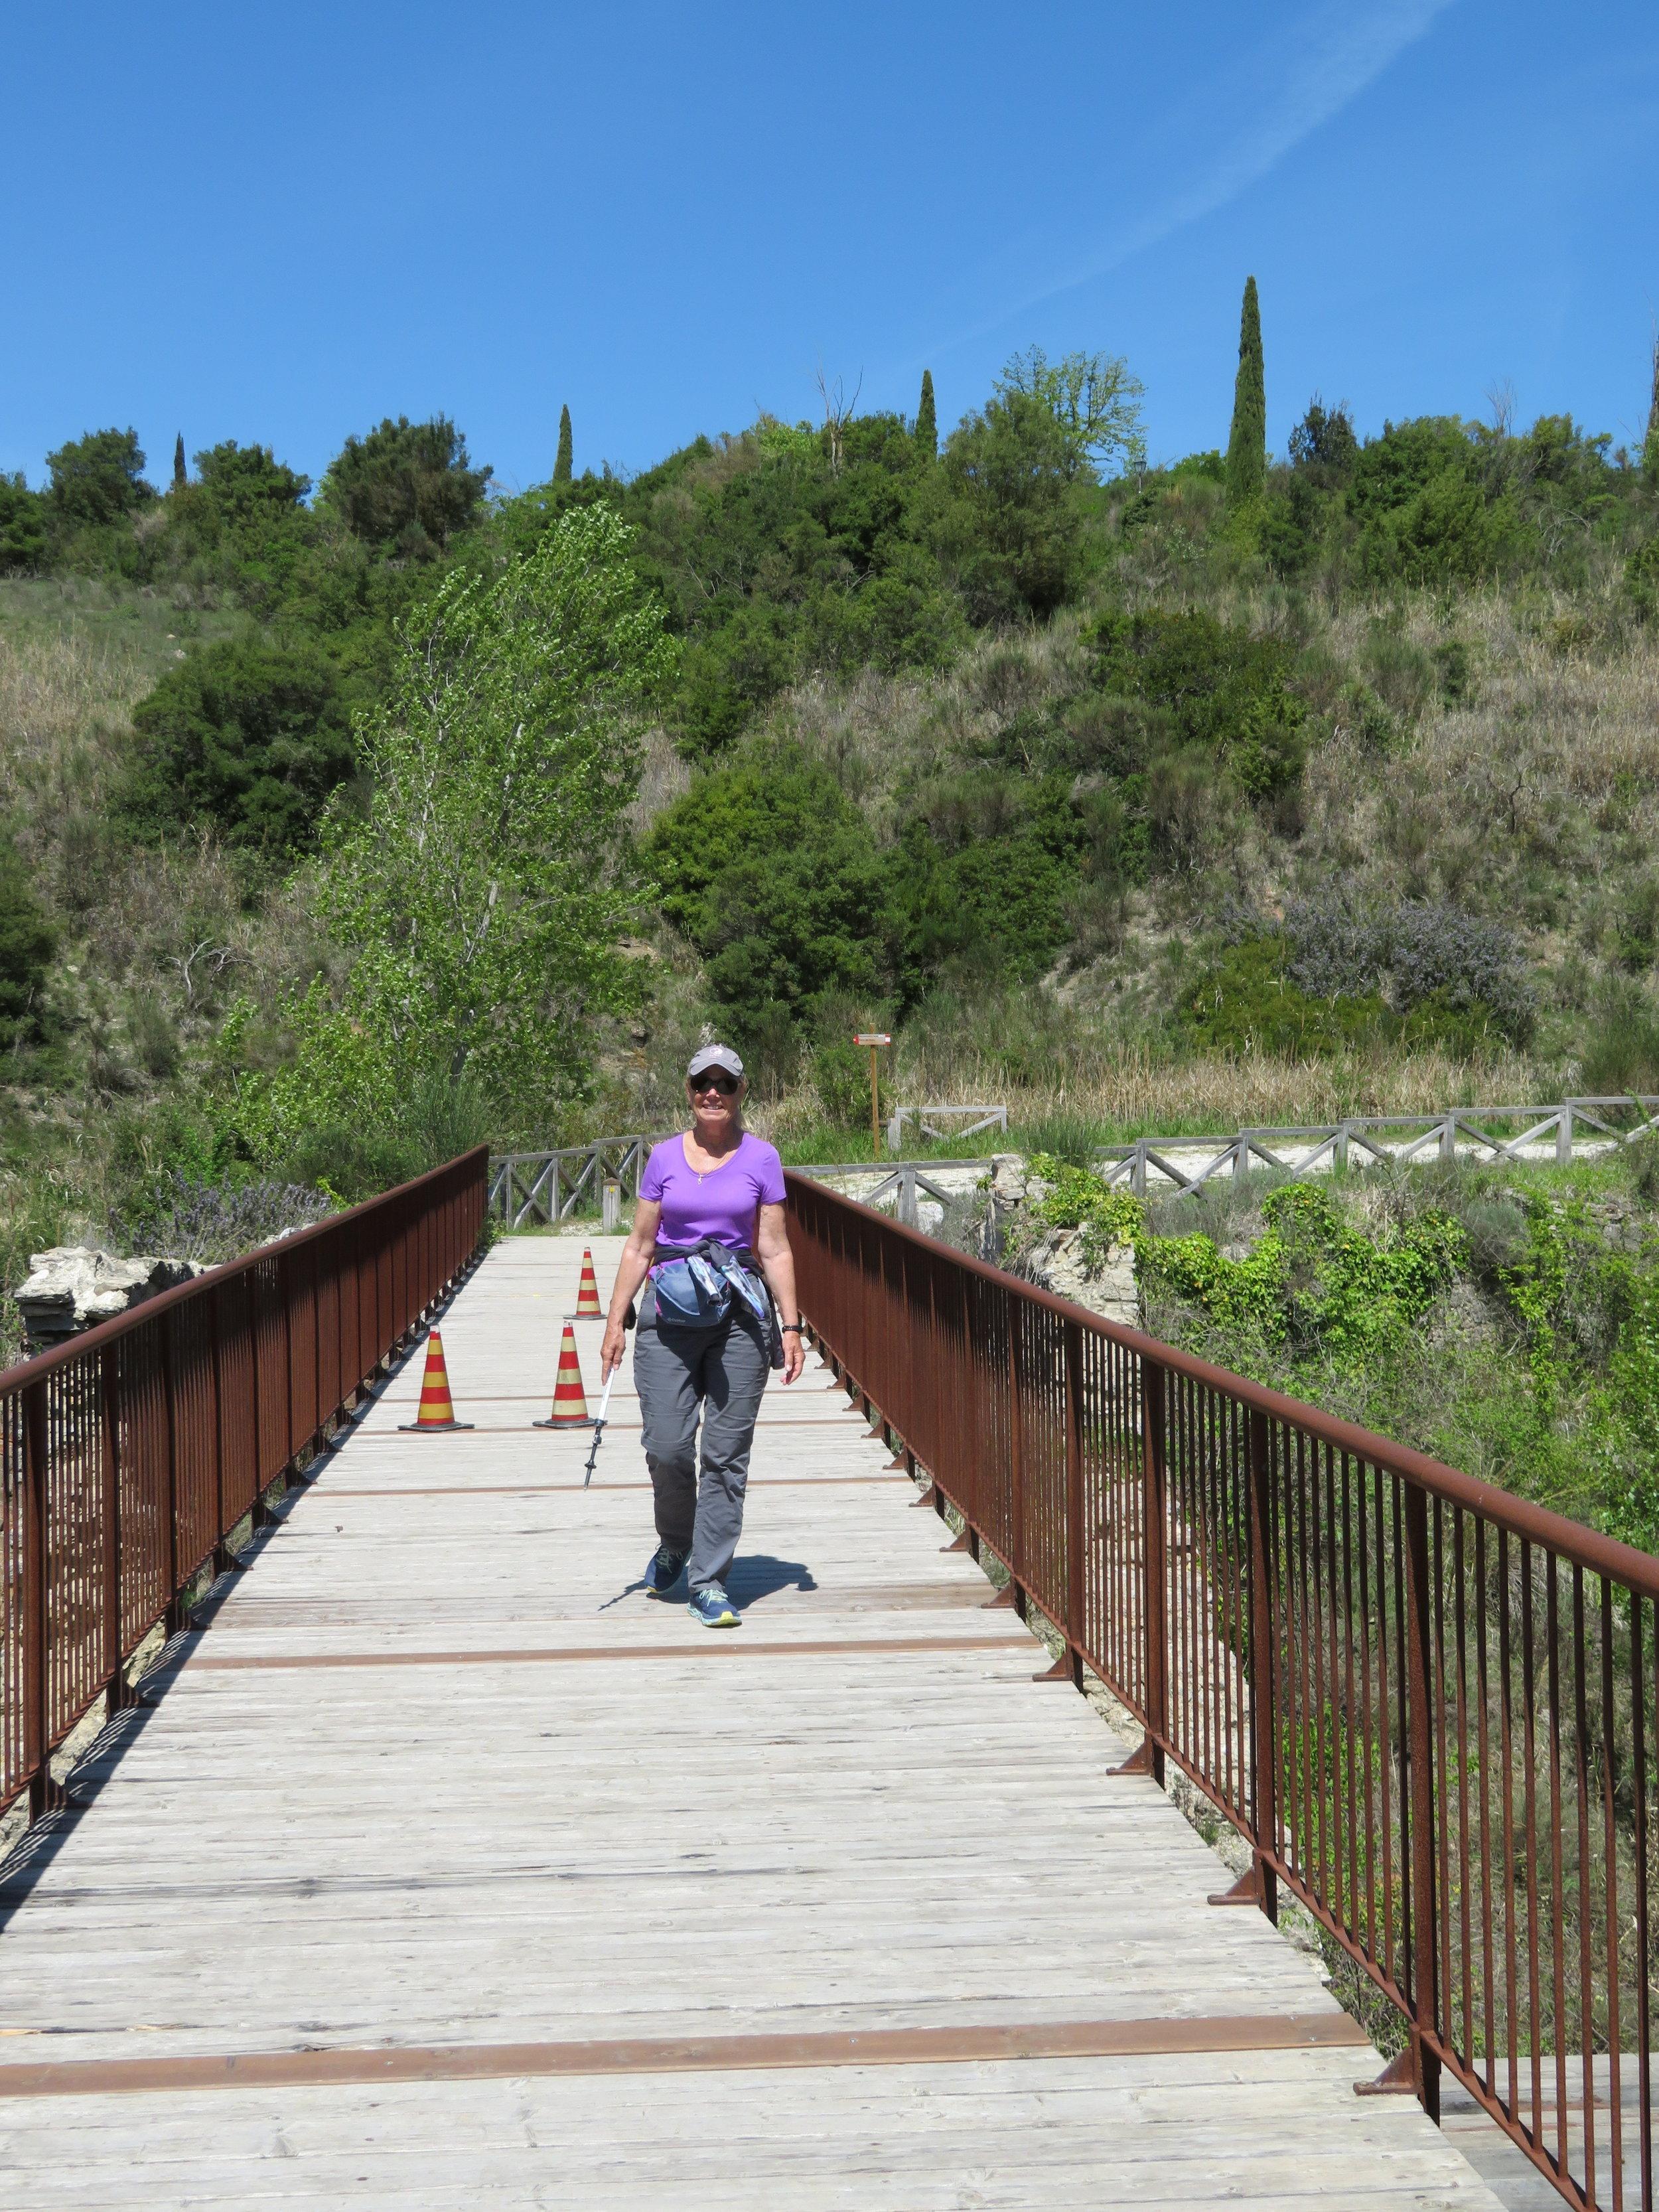 Heading across the Ponte Peruzzi on our way to Gallina